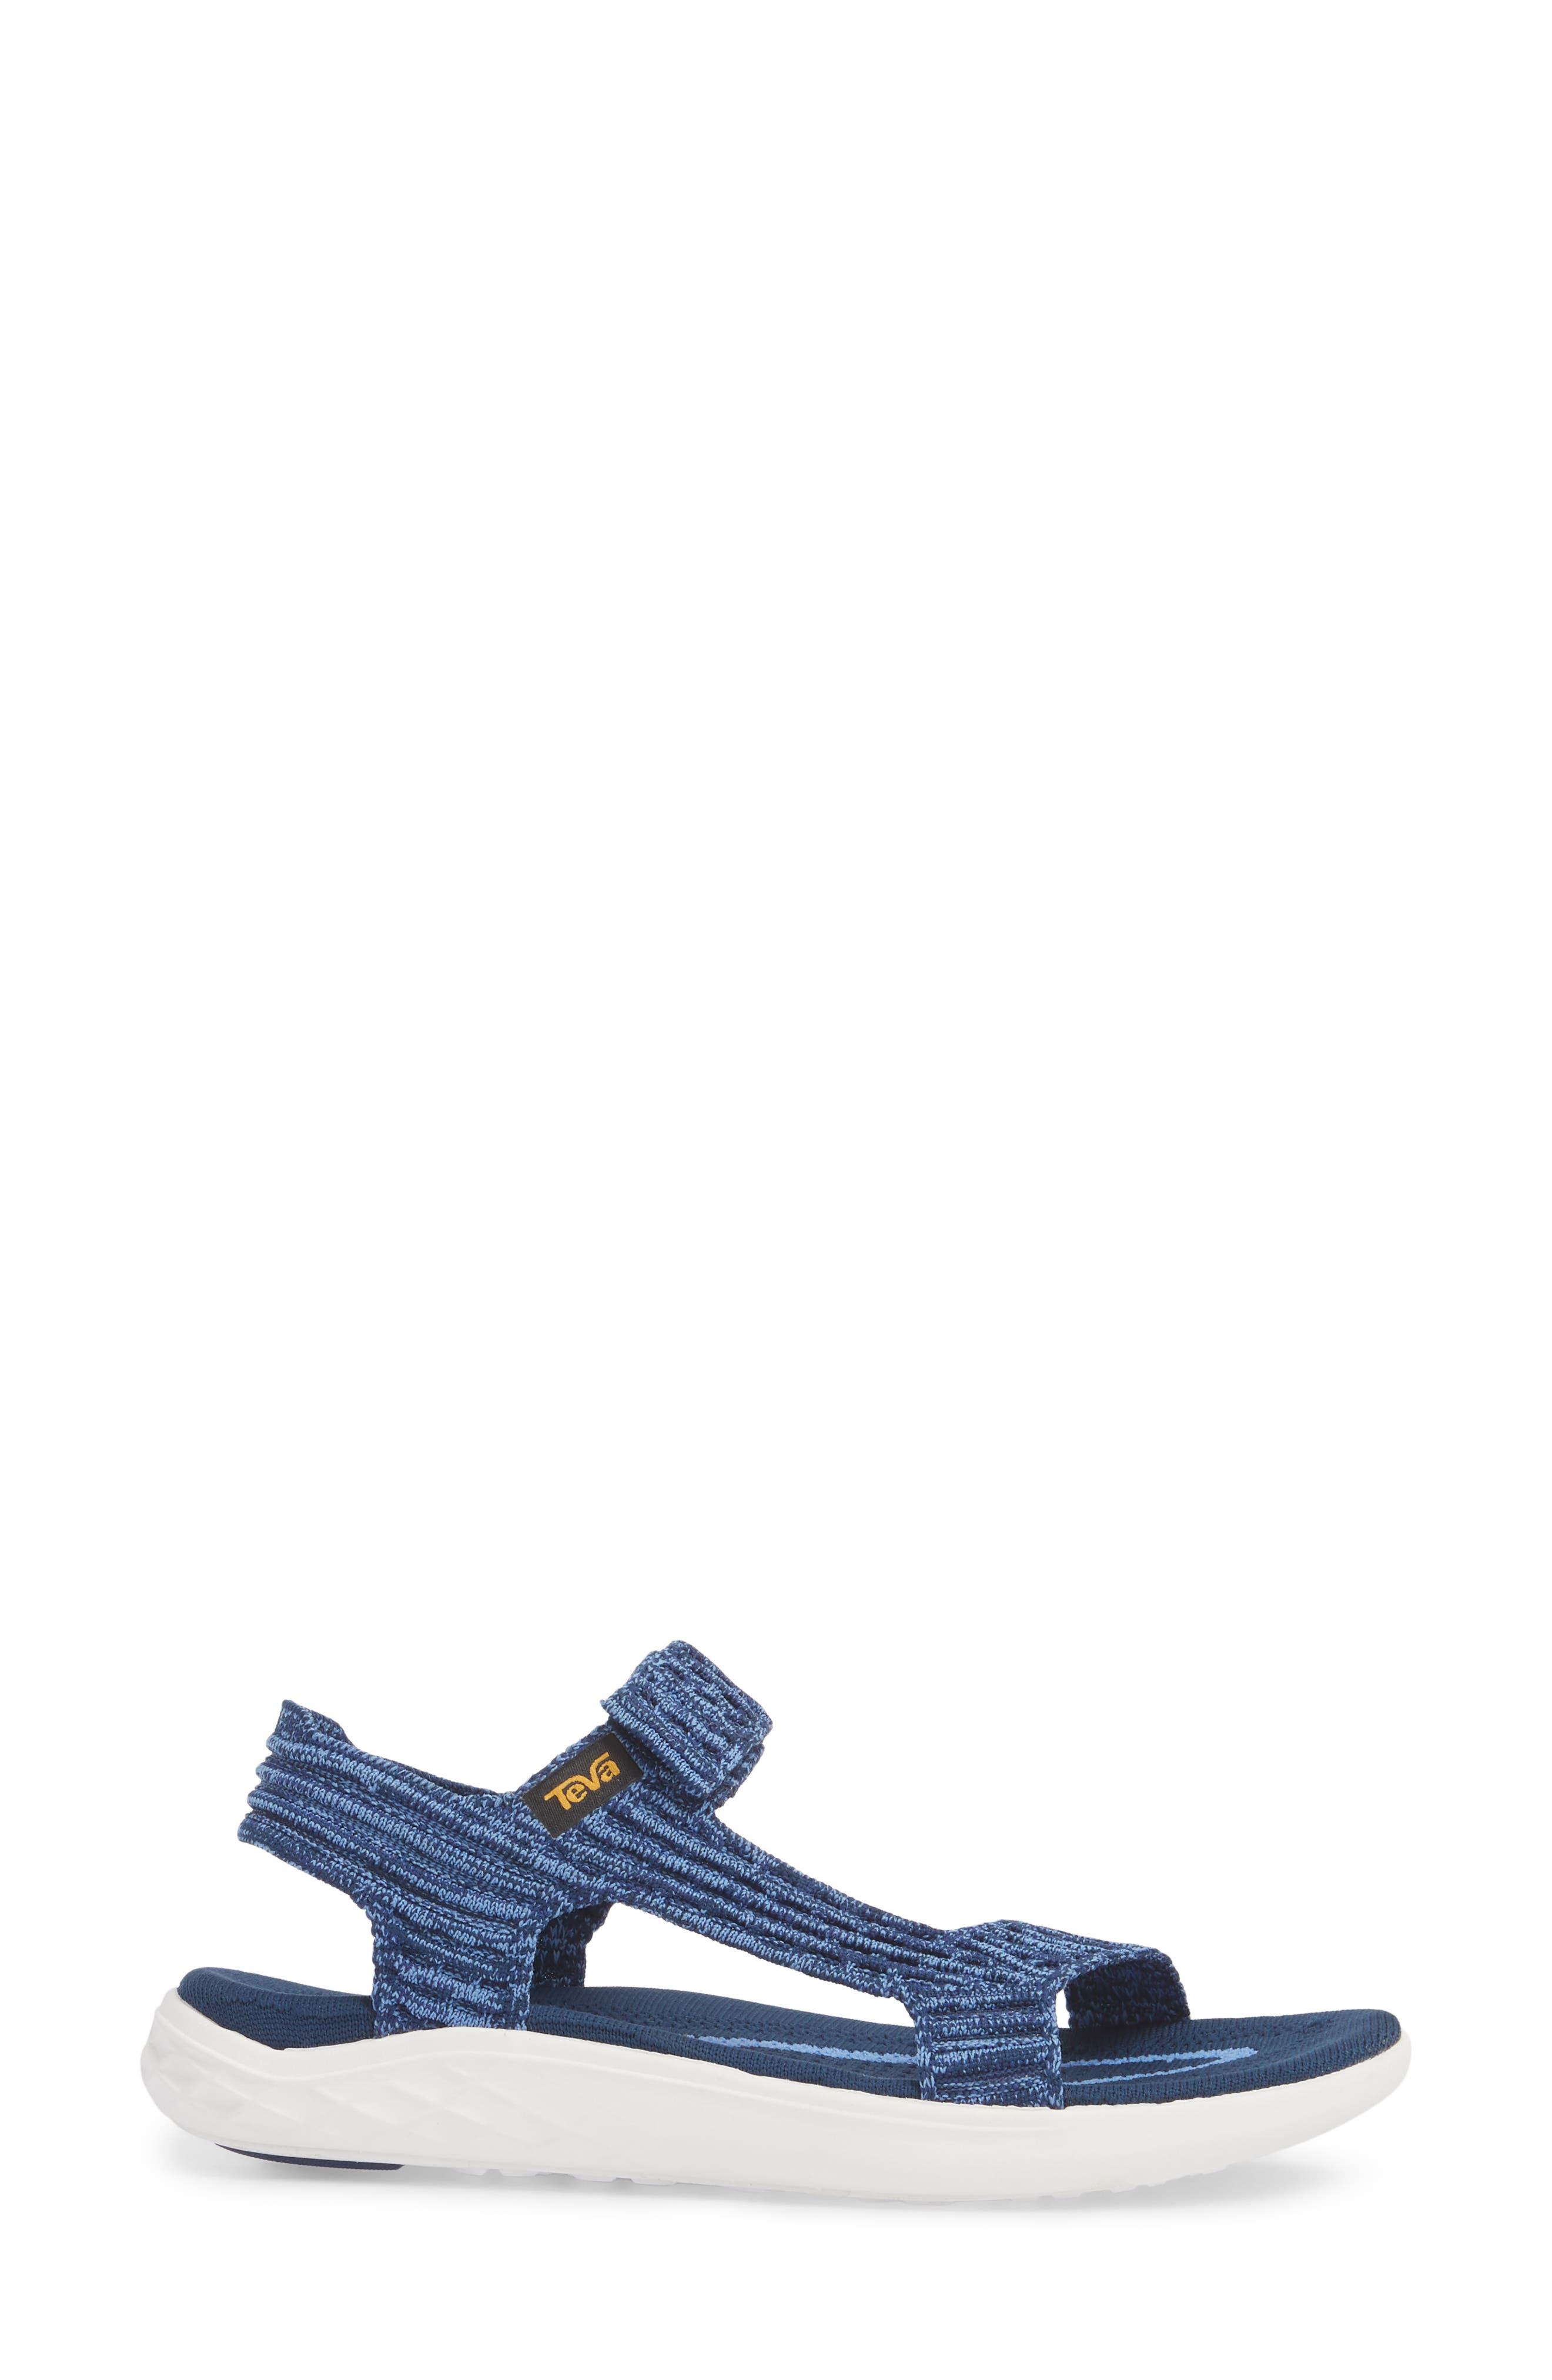 Terra Float 2 Knit Universal Sandal,                             Alternate thumbnail 12, color,